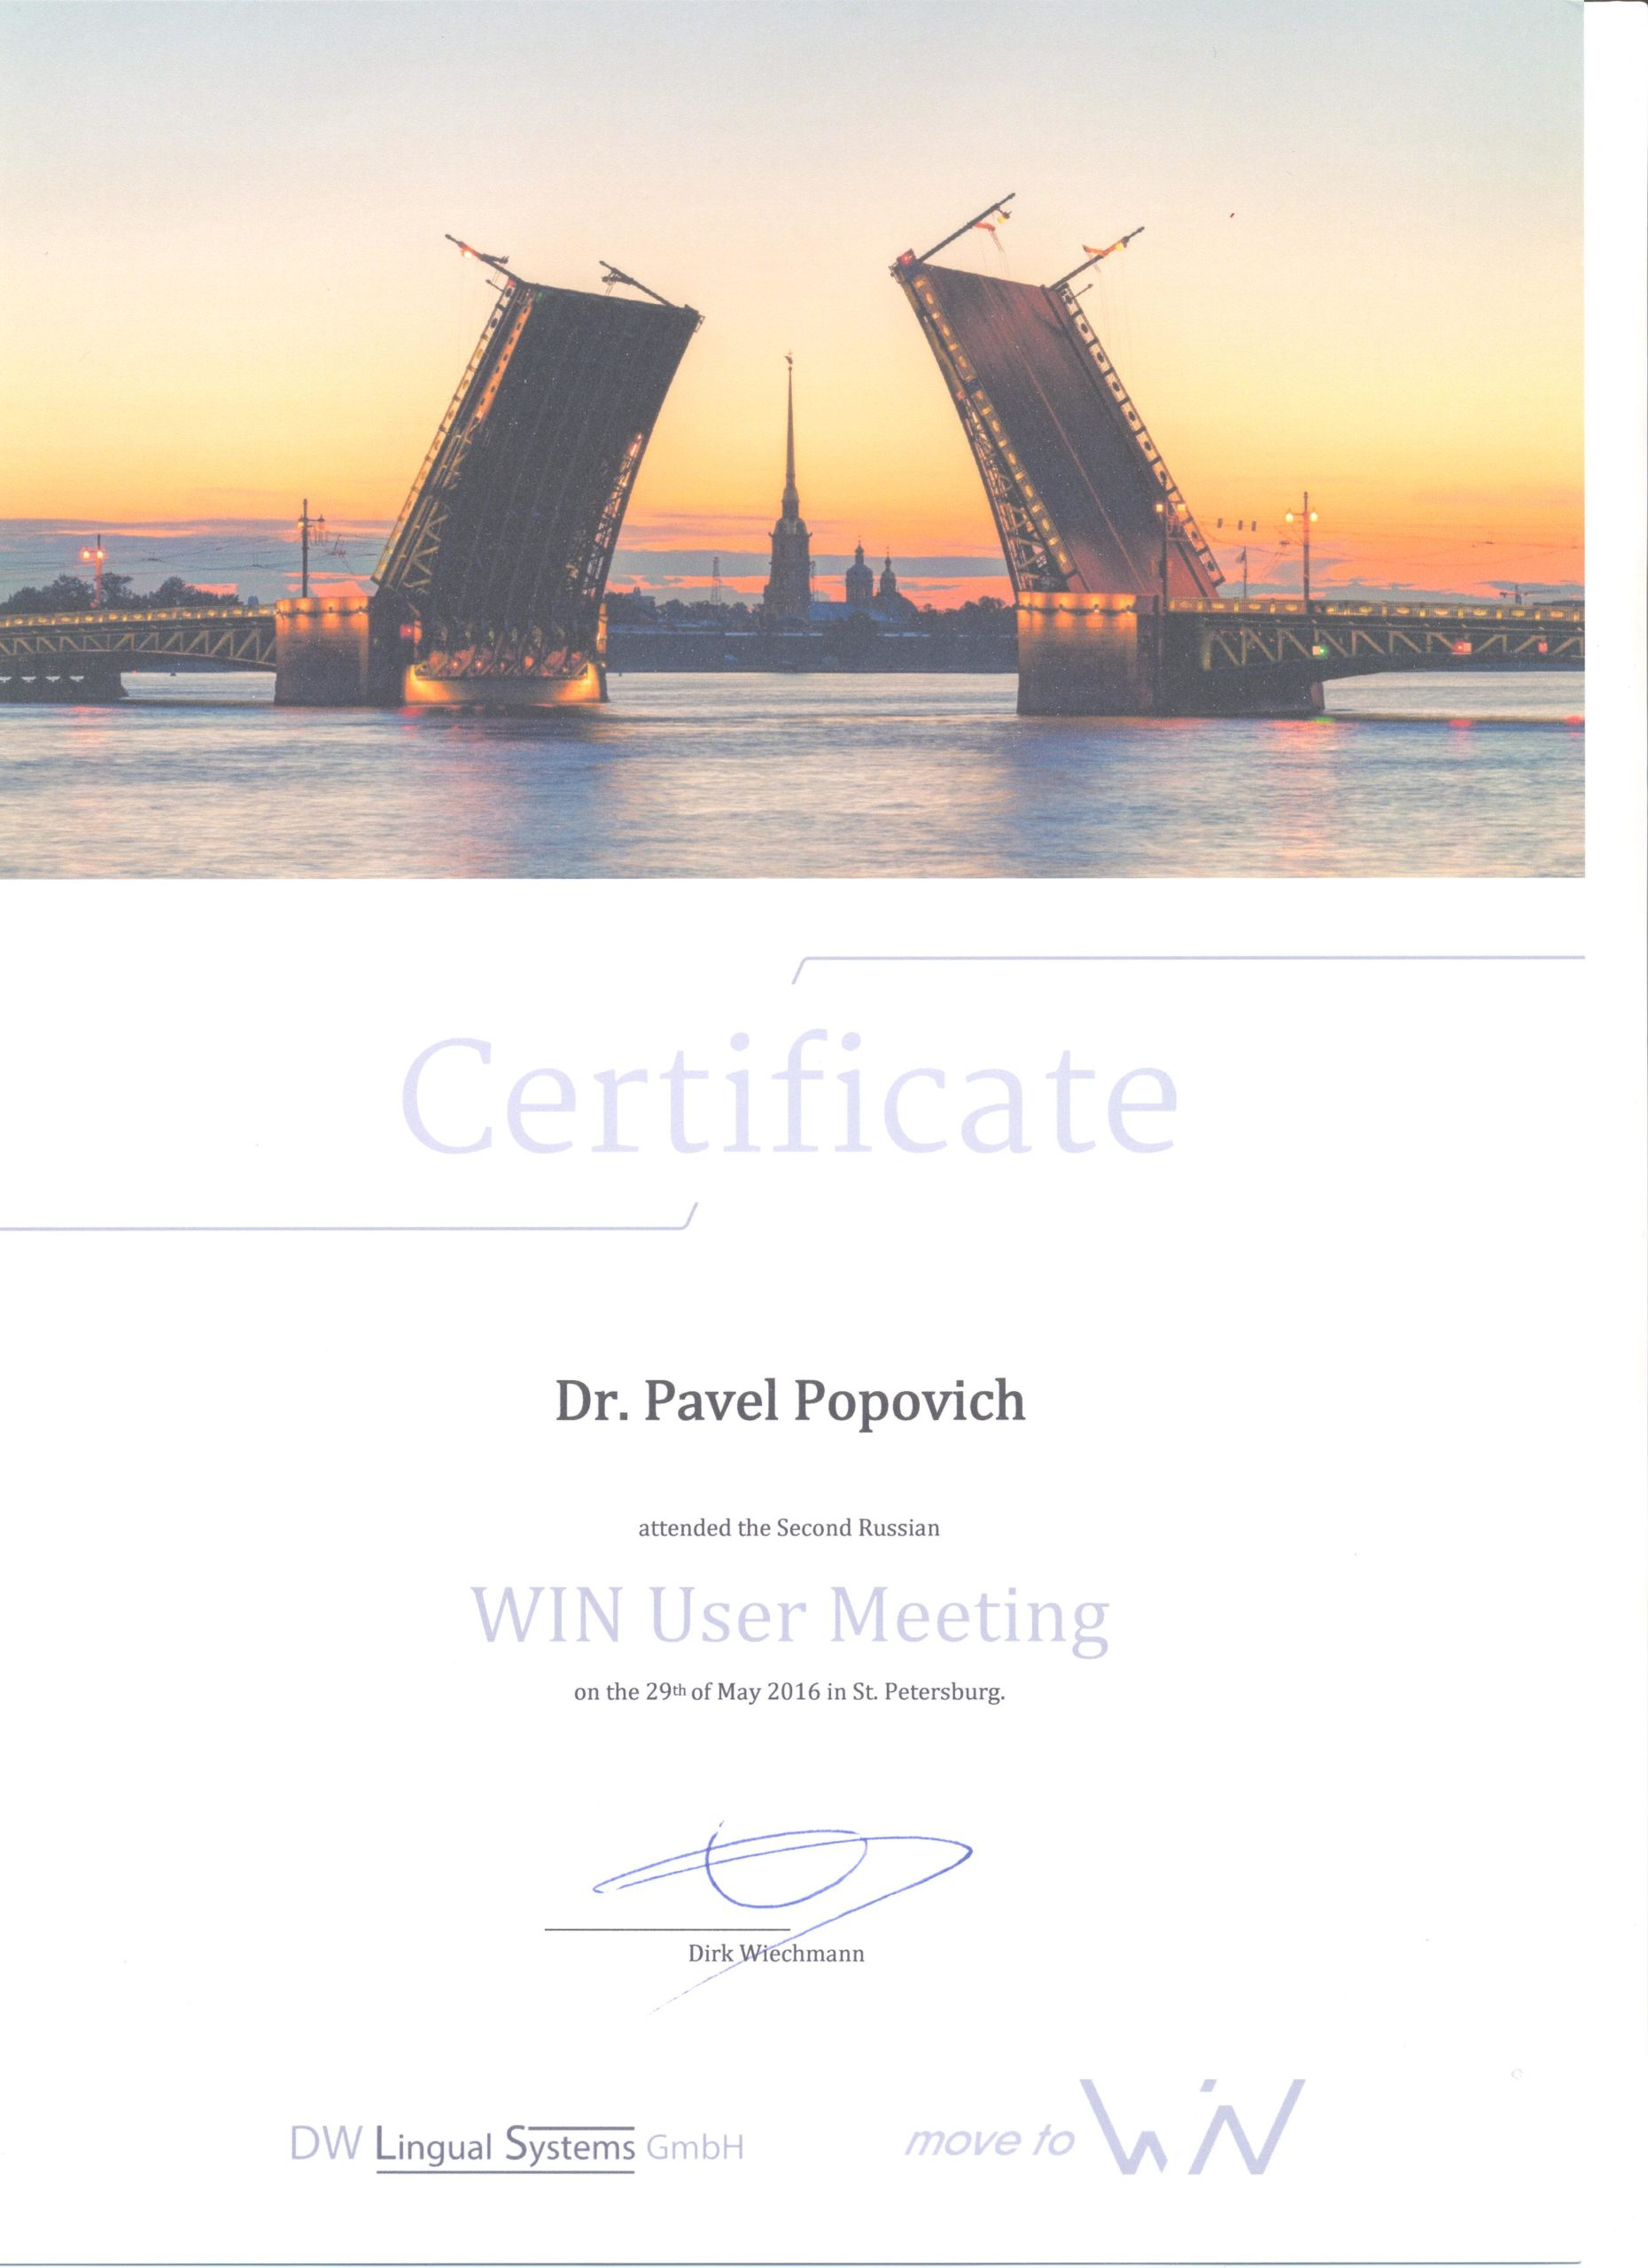 сертификат стоматолога Попович май 2016